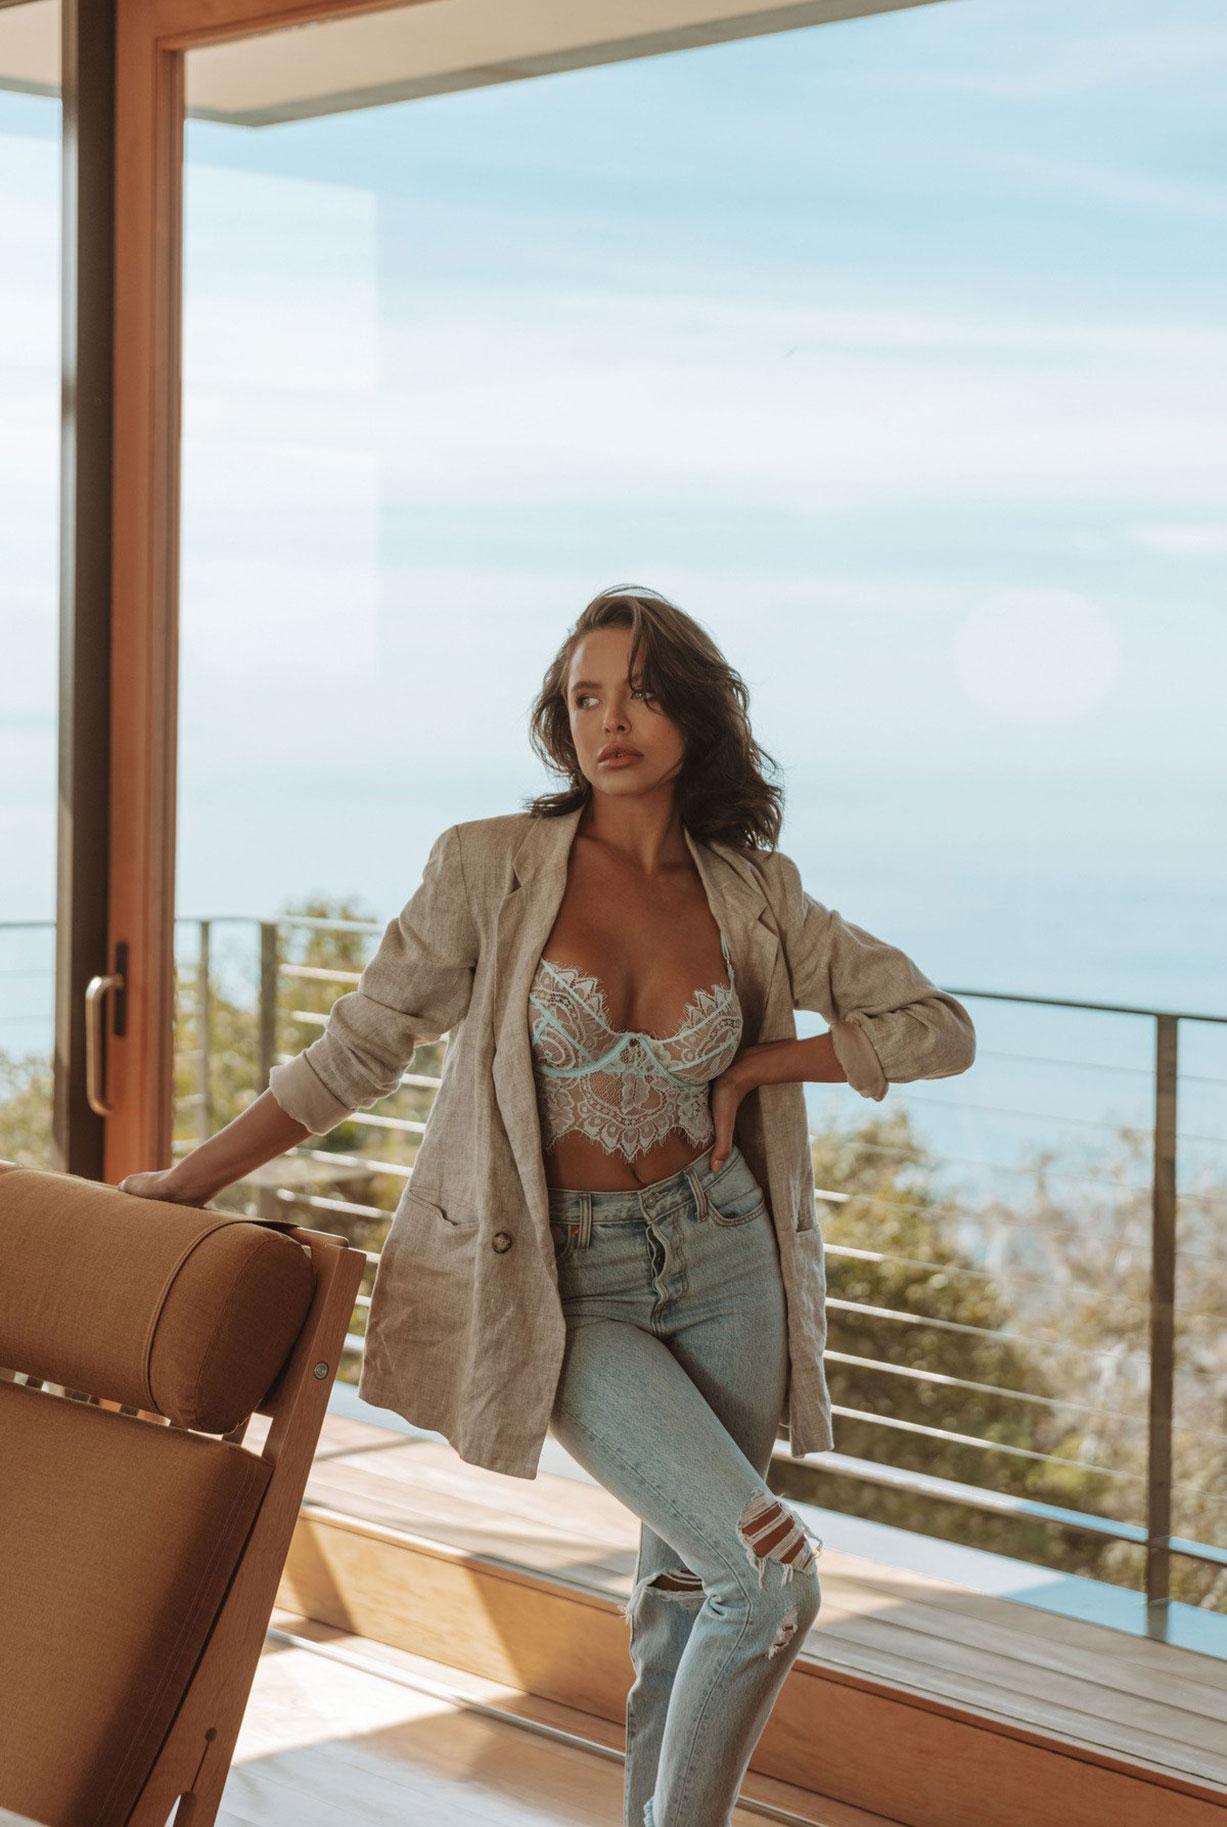 Мара Тиген в нижнем белье и купальниках модного бренда Gooseberry Intimates / фото 17